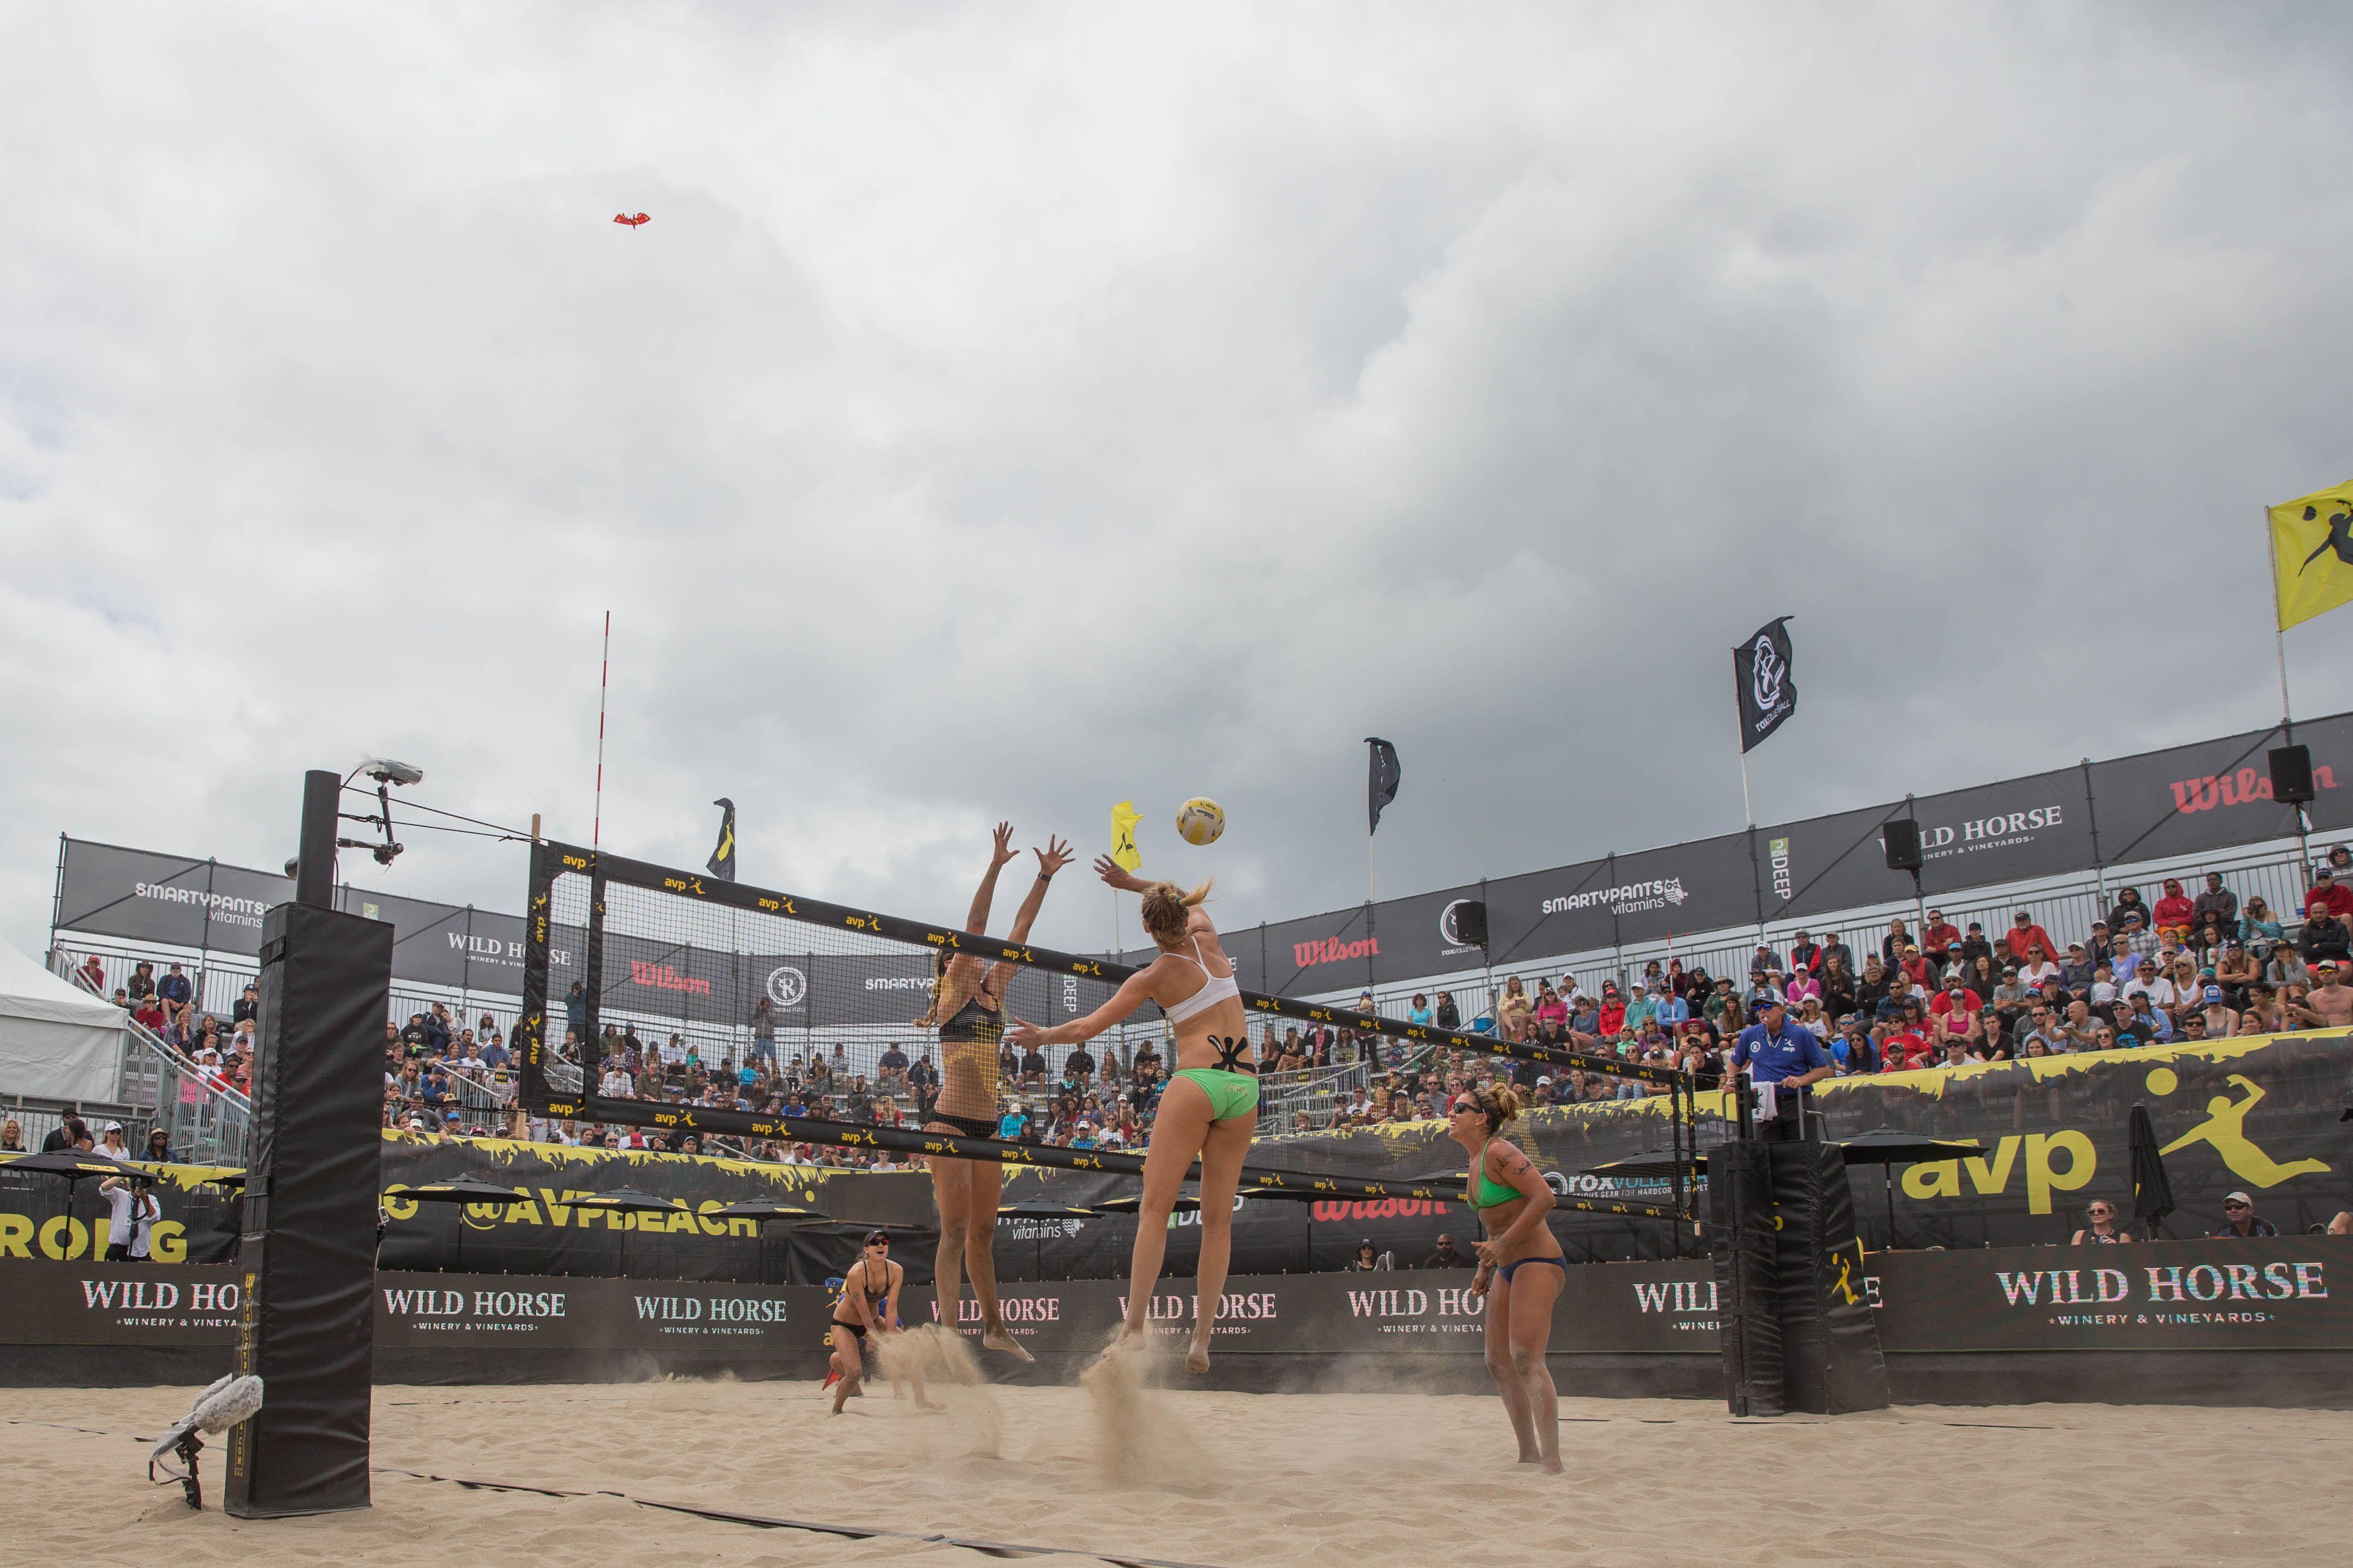 Avp Huntington Beach Open 2017 Photo Gallery Avp Beach Volleyball 2017 Photos Huntington Beach Photo